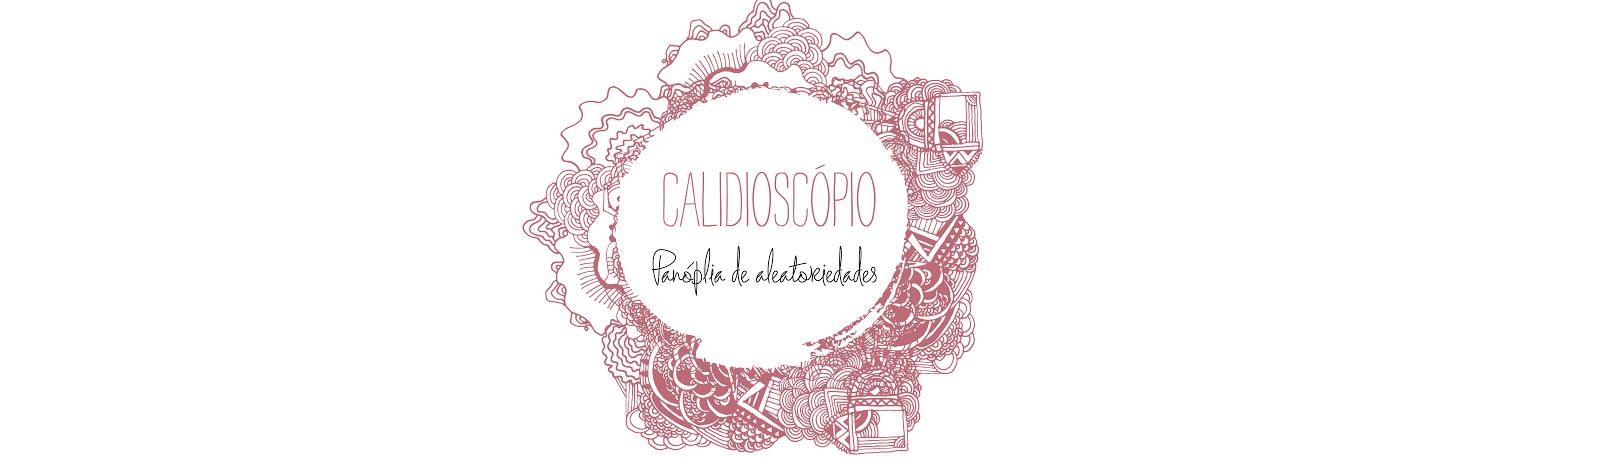 Calidioscópio